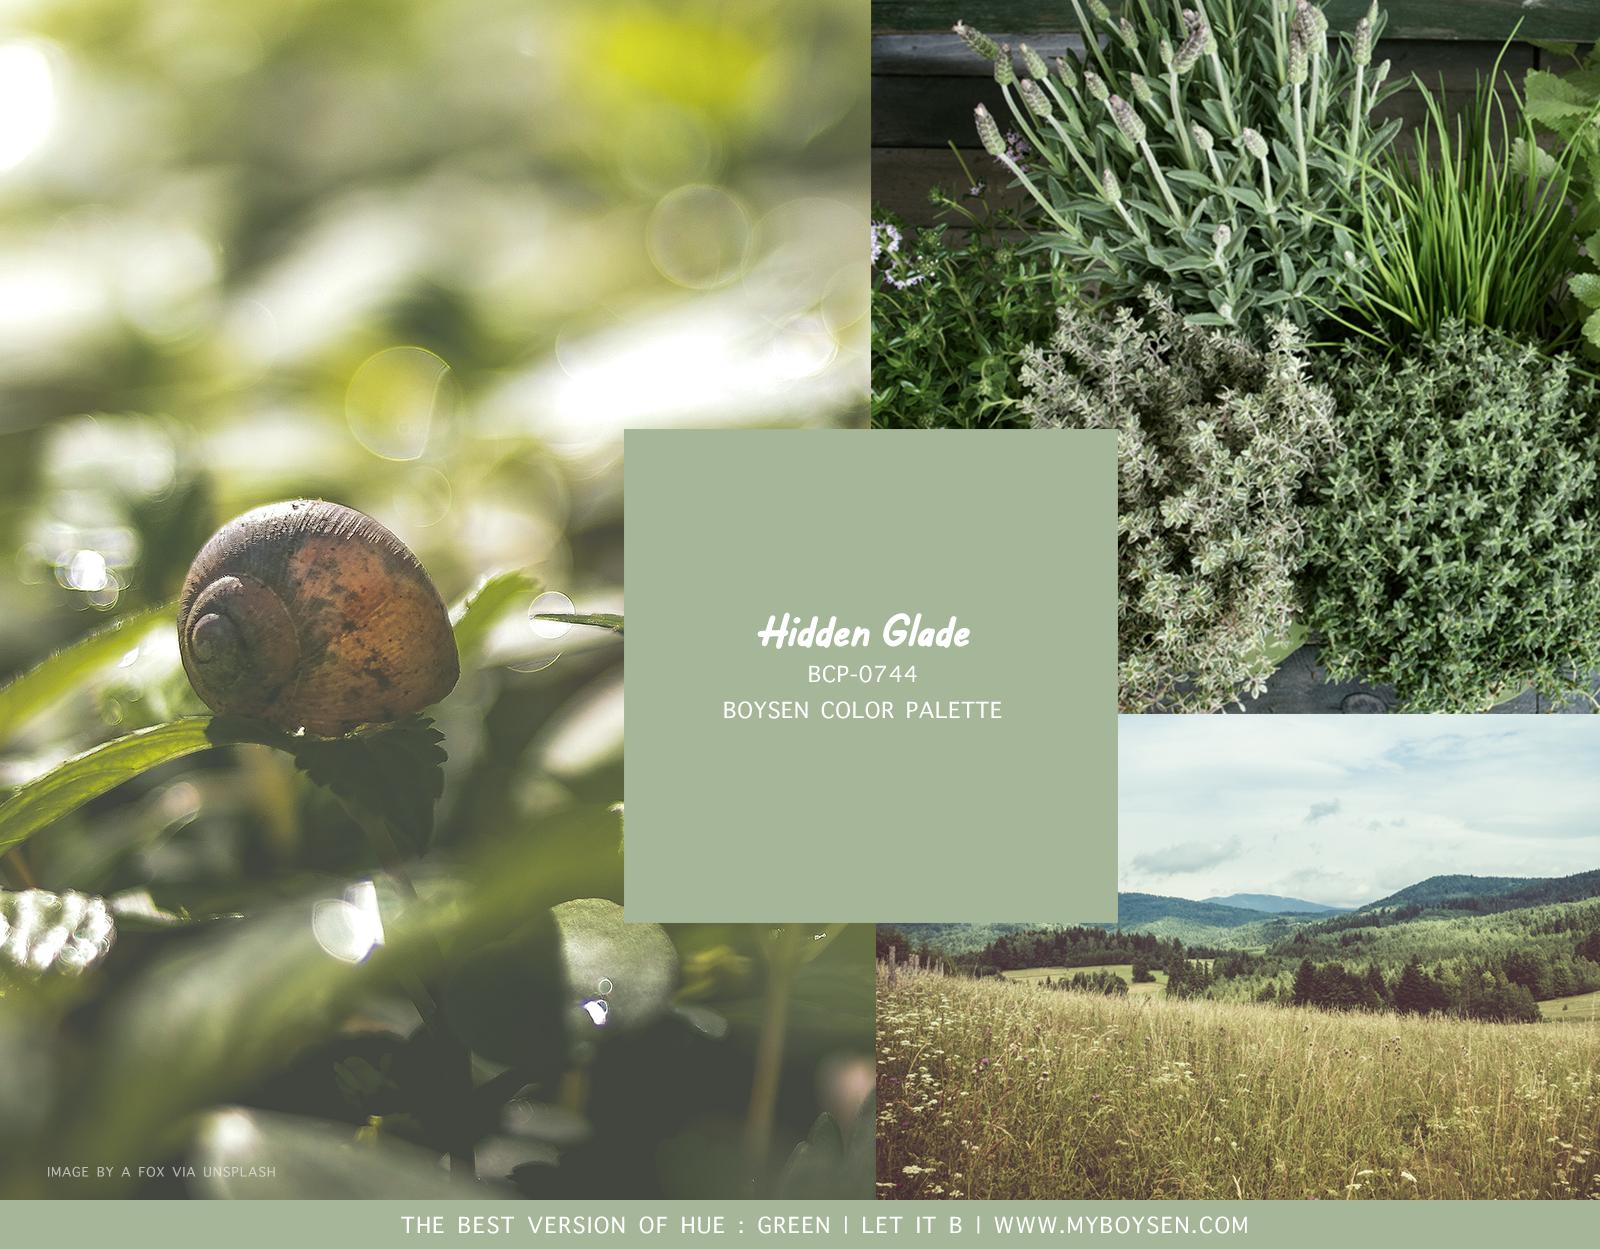 The Best Version of Hue: Green 4 - Hidden Glade